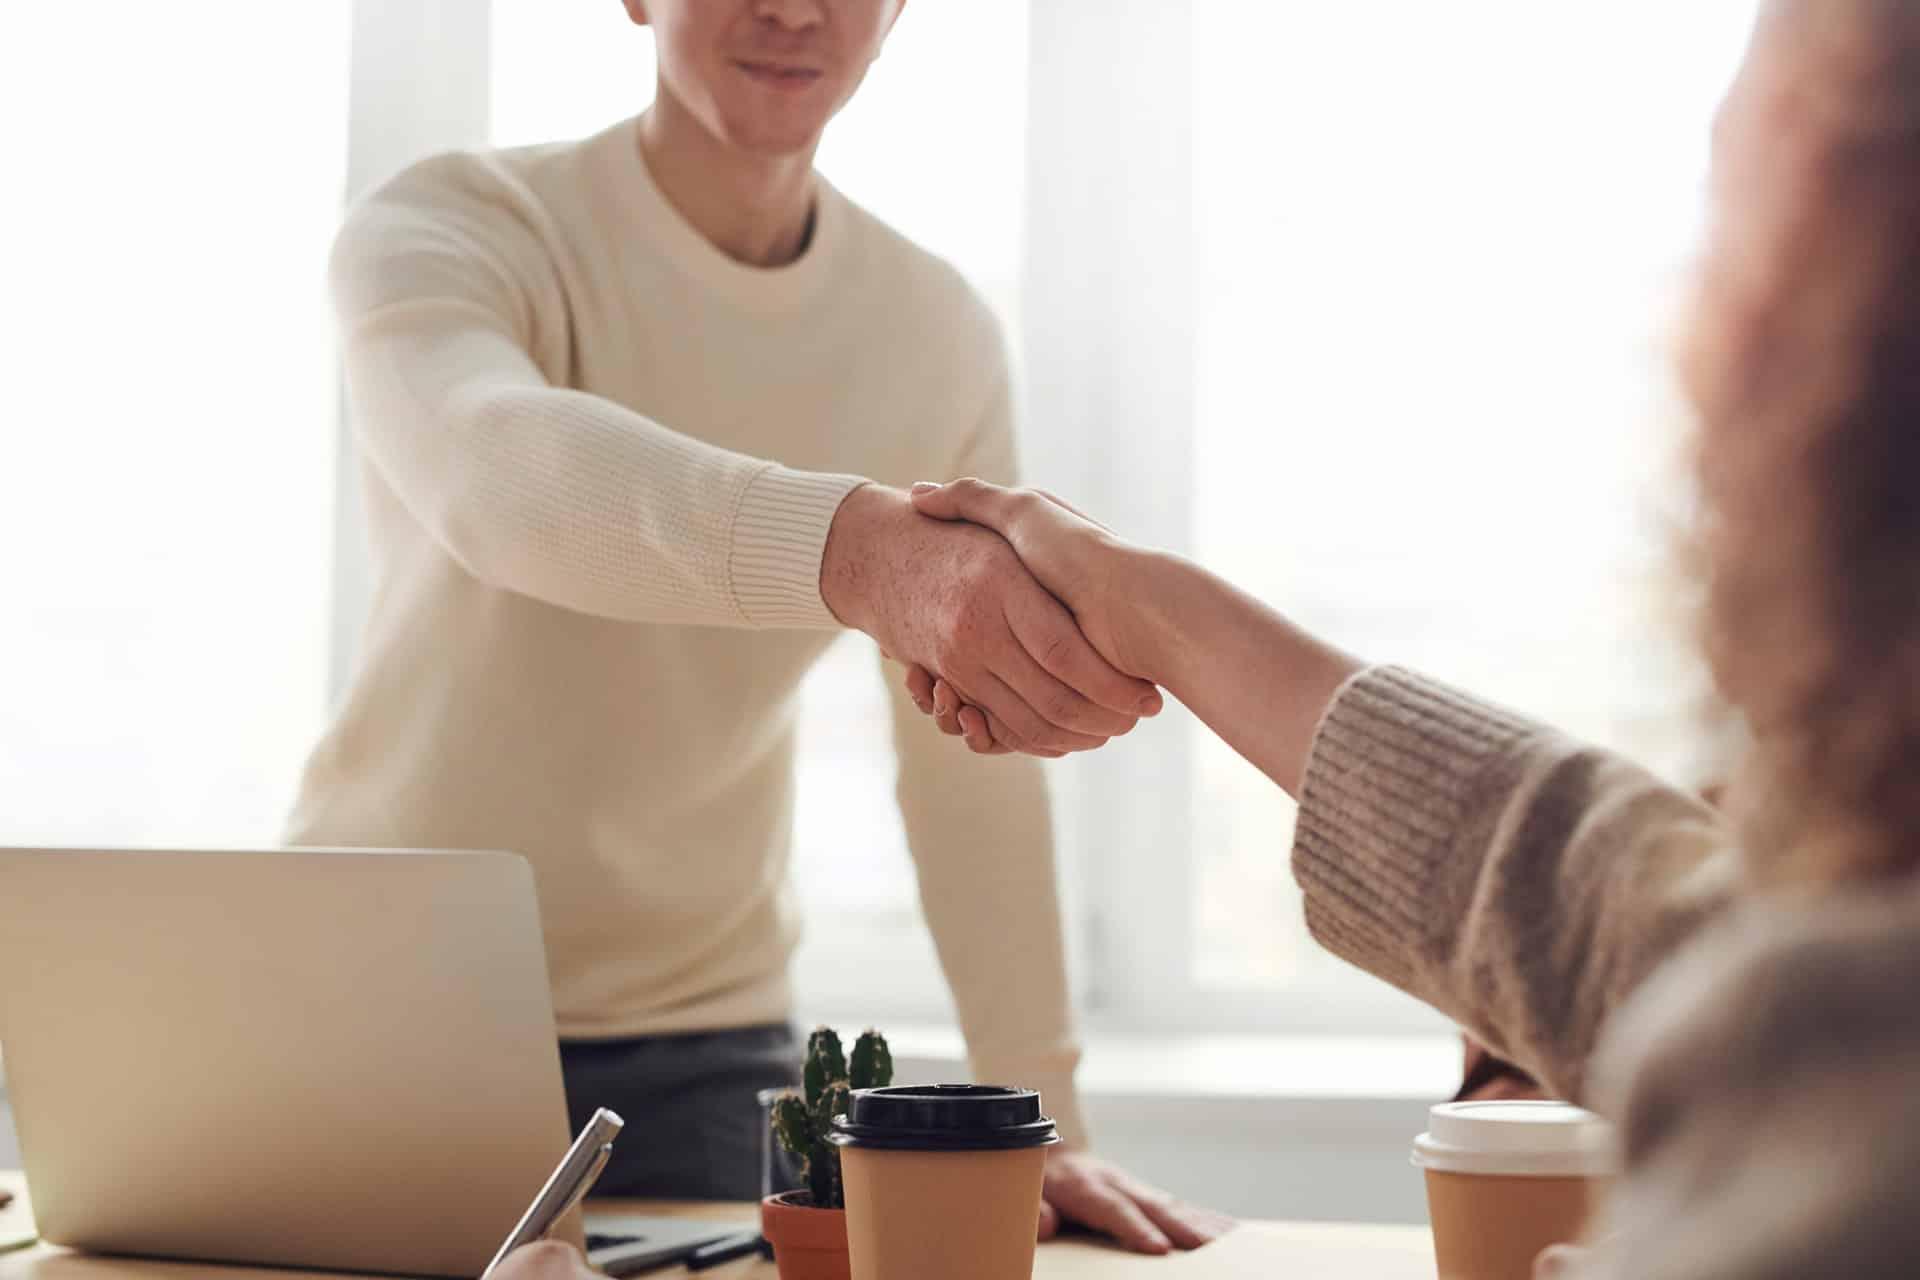 get a job offer after any job interview